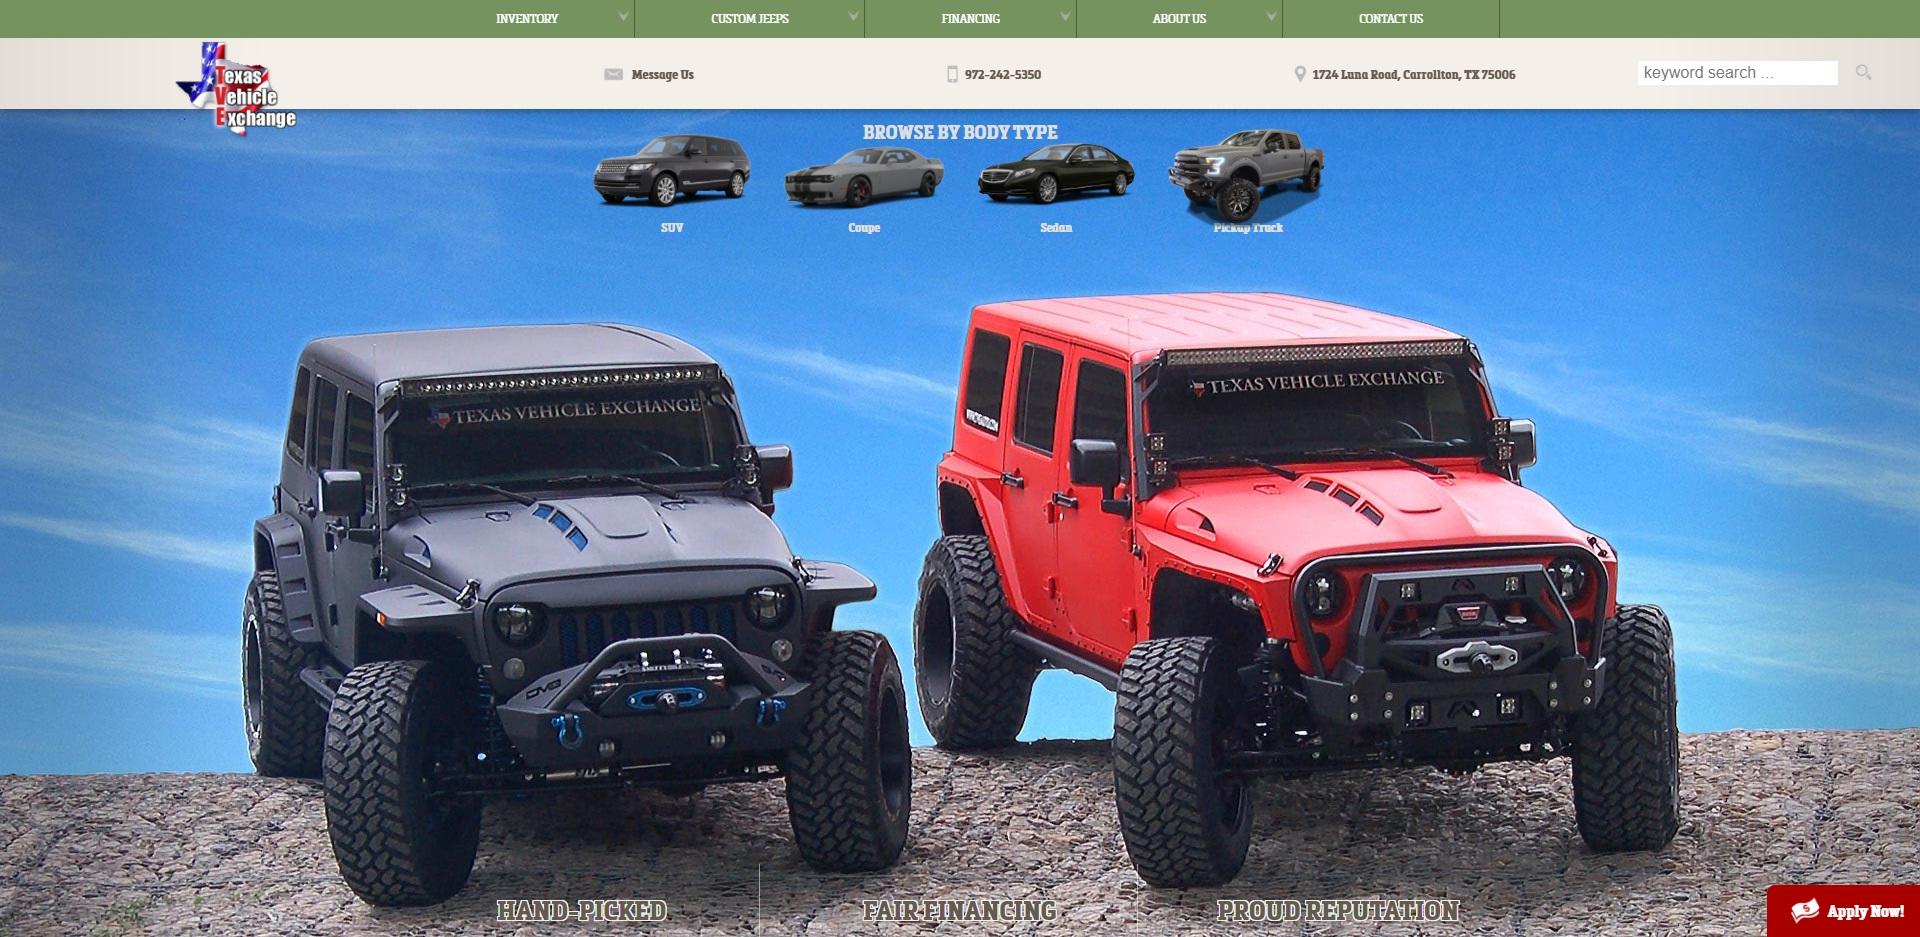 Best Jeep Dealers in Dallas